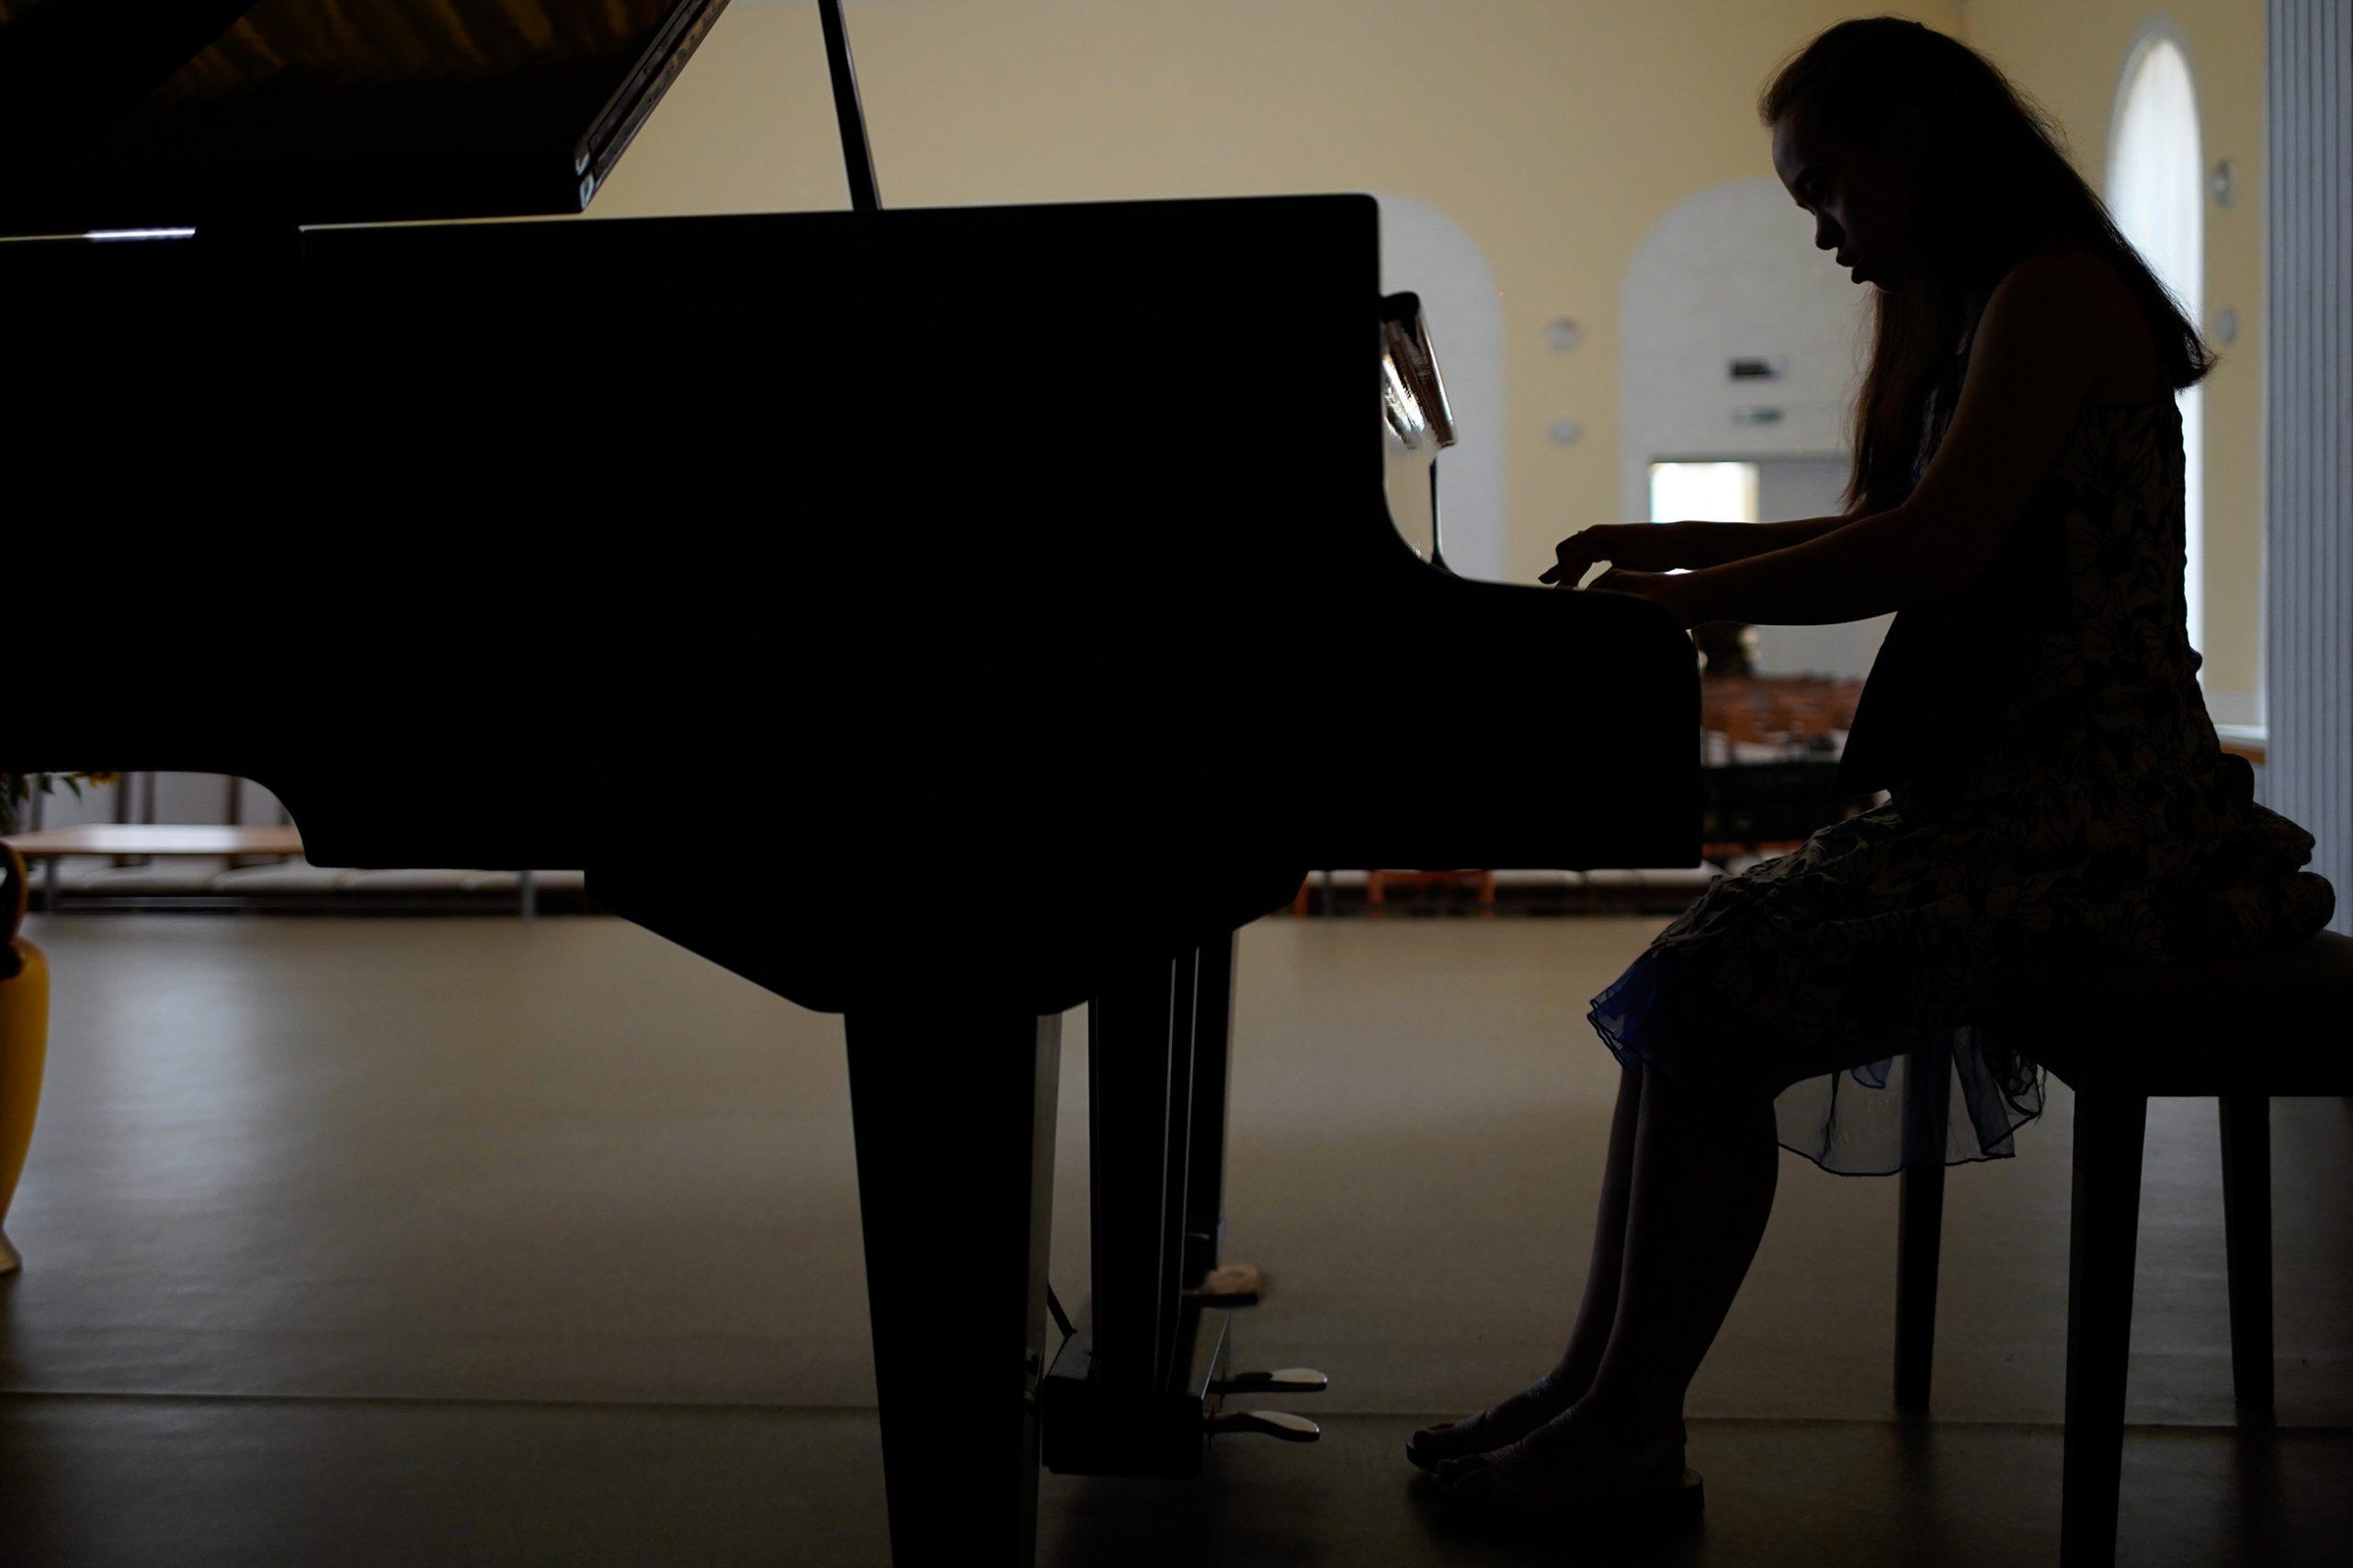 tch7282 scaled - <b>Музыка для Лизы.</b> Как пианистка с синдромом Дауна и ее мама борются за право на образование - Заборона